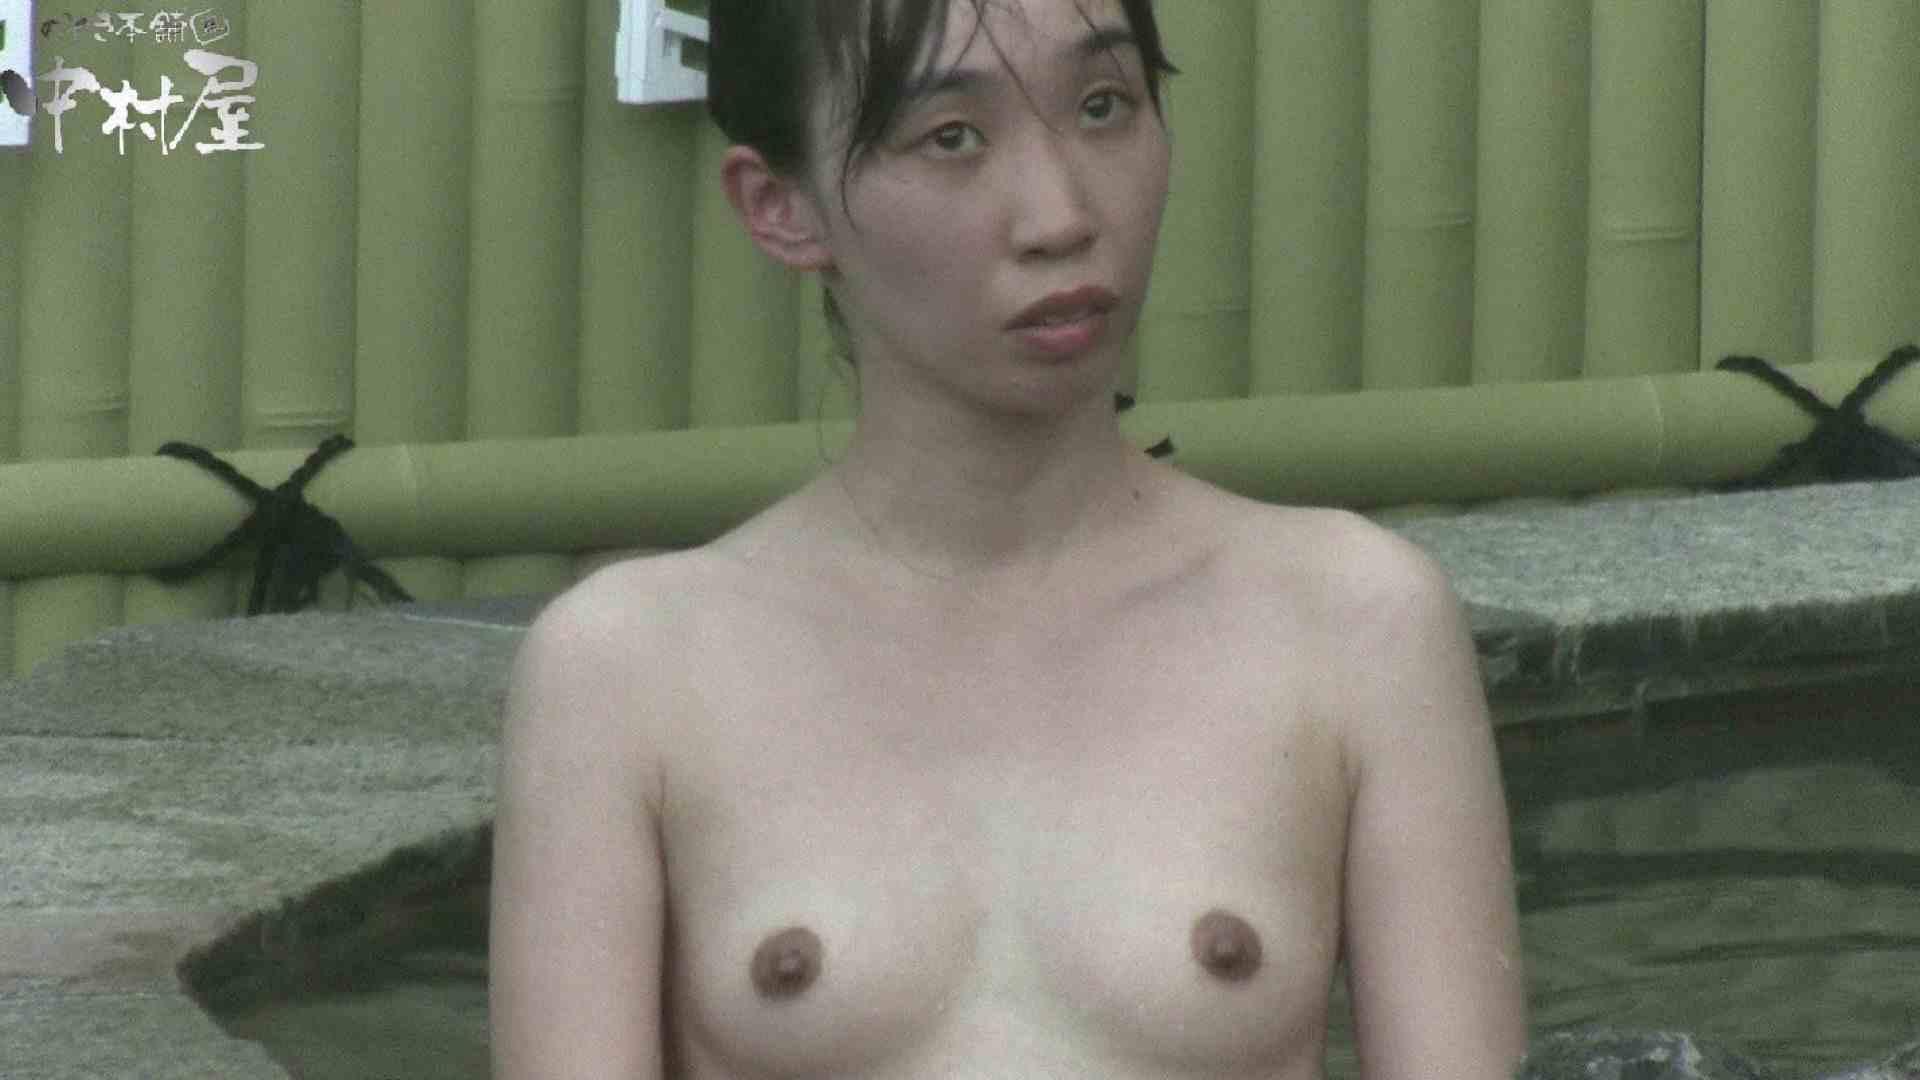 Aquaな露天風呂Vol.910 盗撮シリーズ | 露天風呂編  84PIX 27